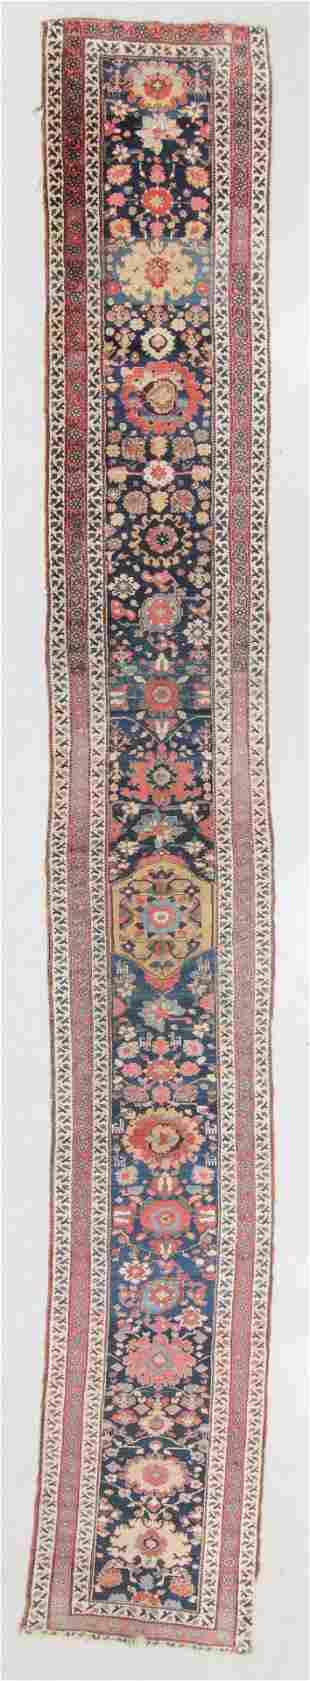 West Persian Kurd Rug, Early 19th C., 2'9'' x 19'11''